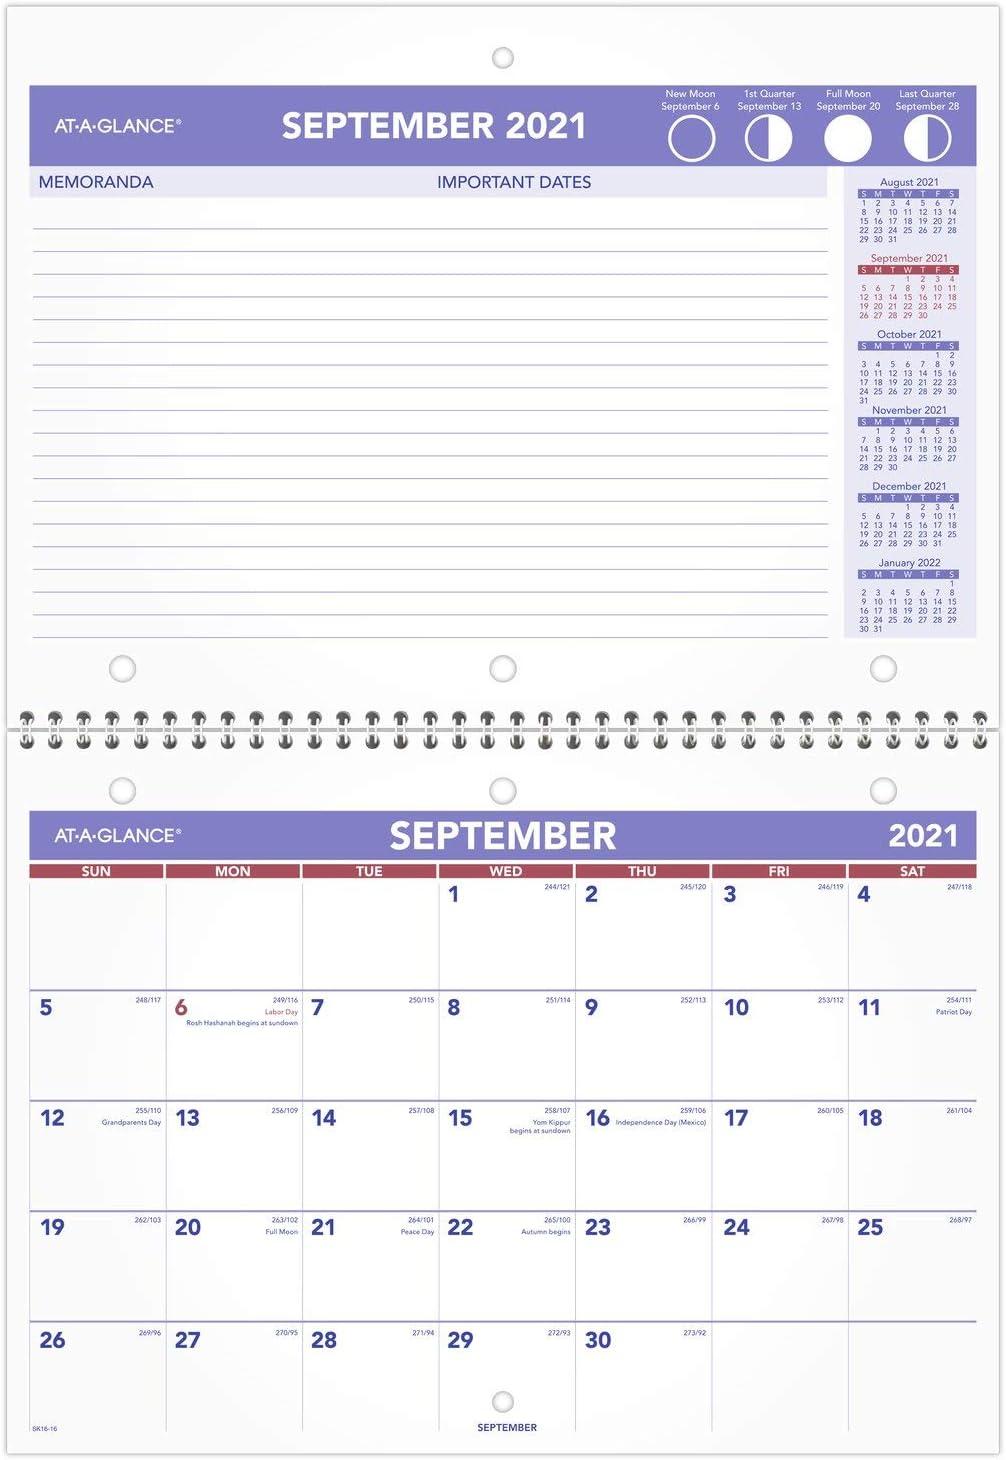 At A Glance Wall Calendar 2022.Amazon Com Academic Wall Desk Calendar 2021 2022 At A Glance Monthly 11 X 8 Small For School Teacher Student Sk1616 Office Products